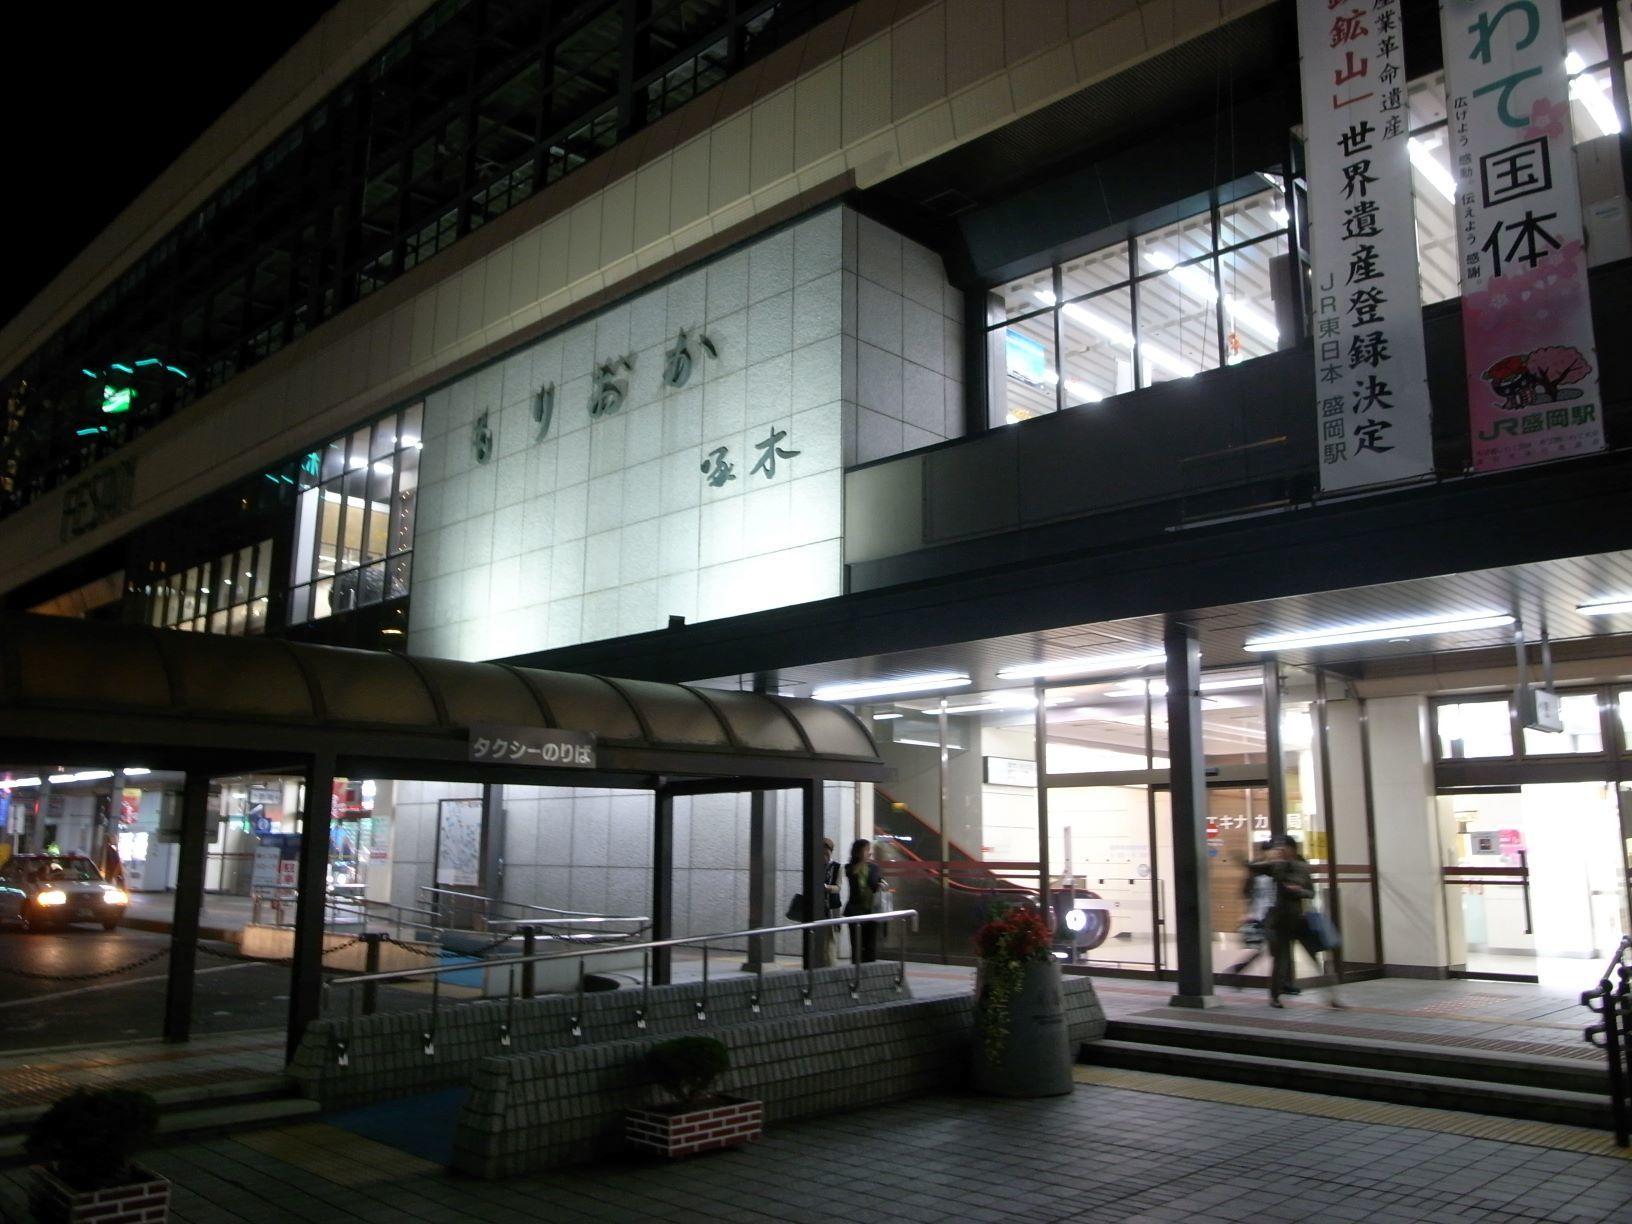 エア外食(盛岡冷麺)_d0389370_19193880.jpg